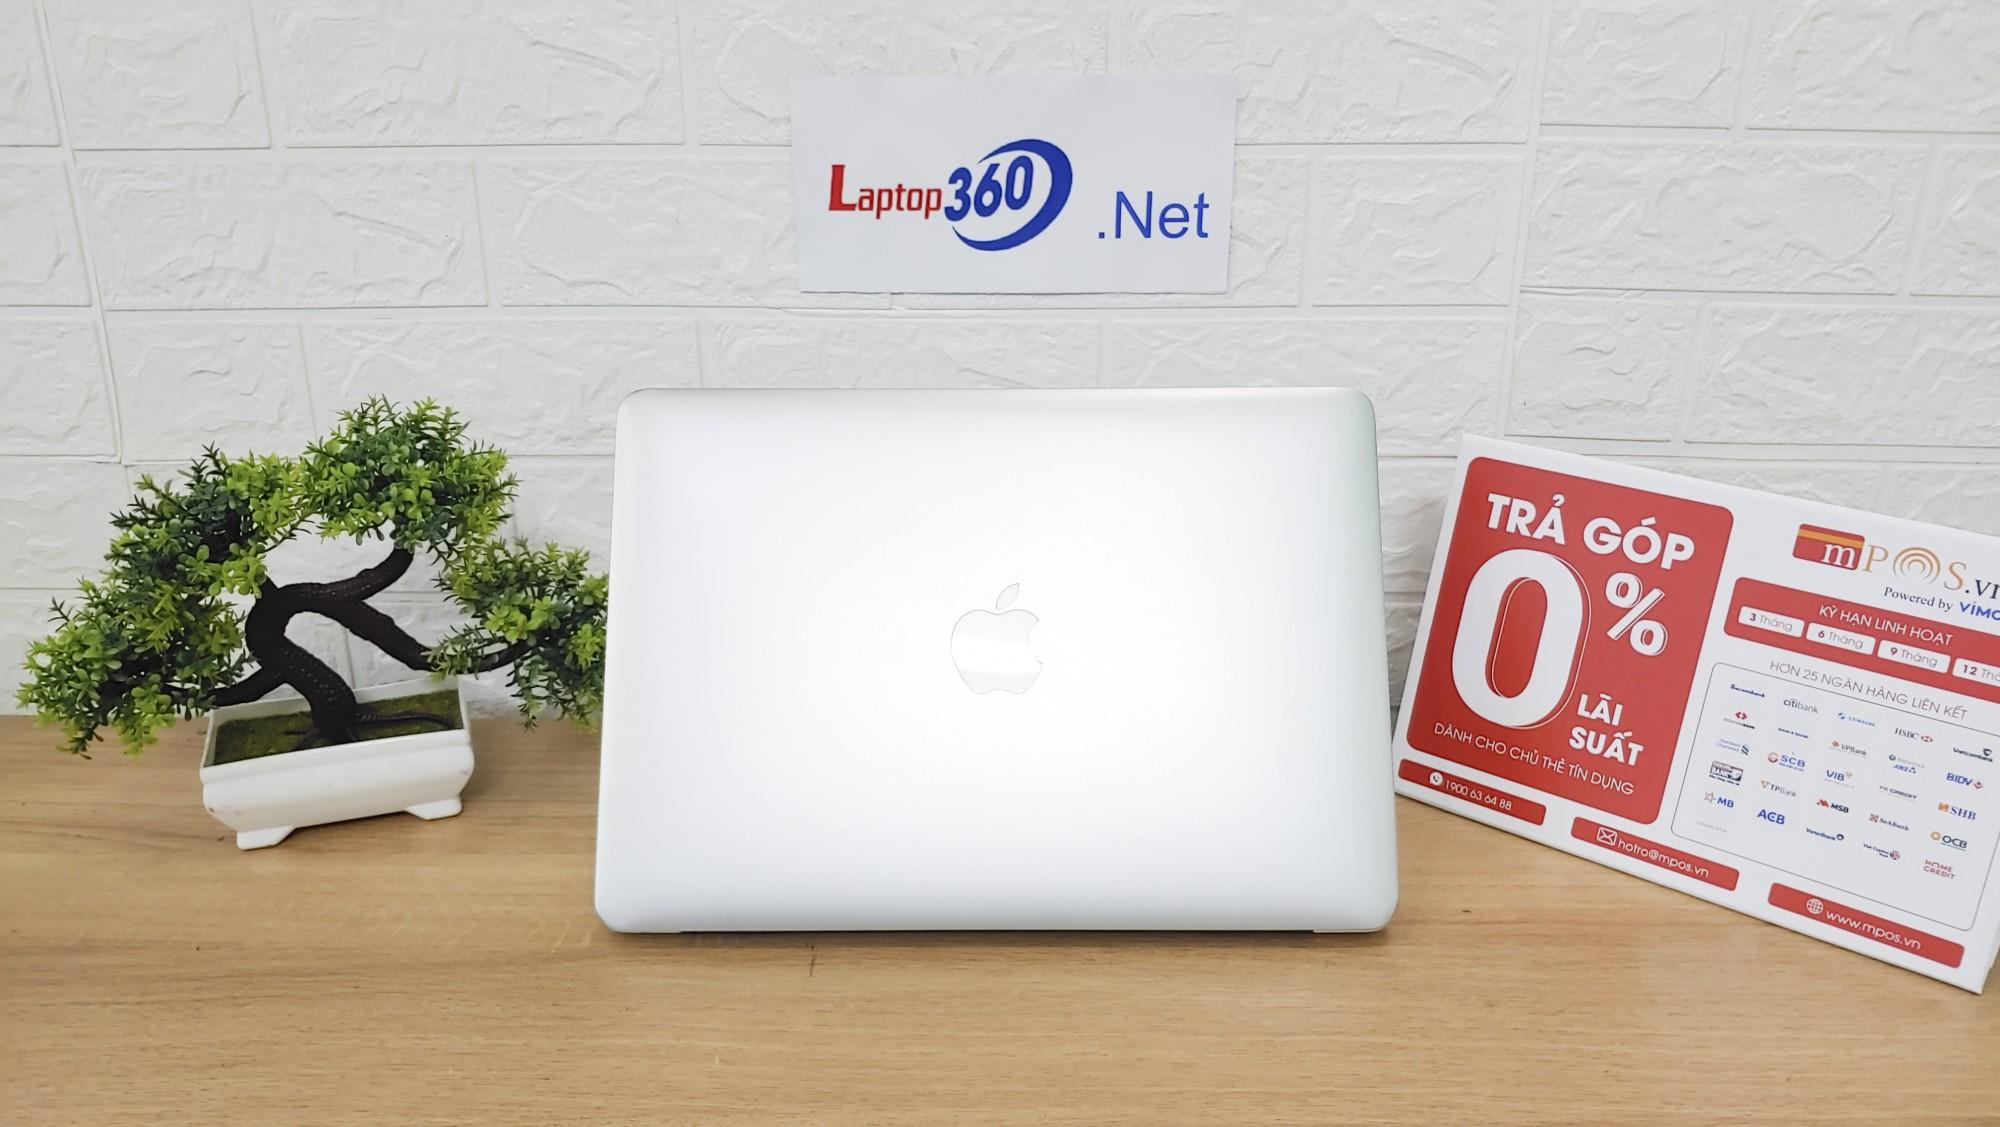 MacBook Air 2013 13 Inch